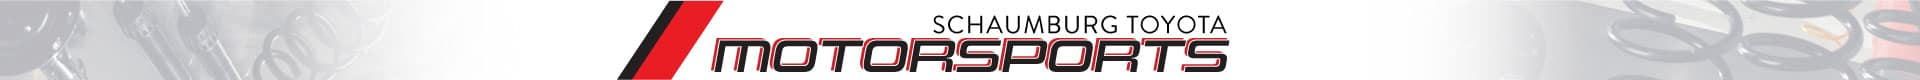 Motorsports header